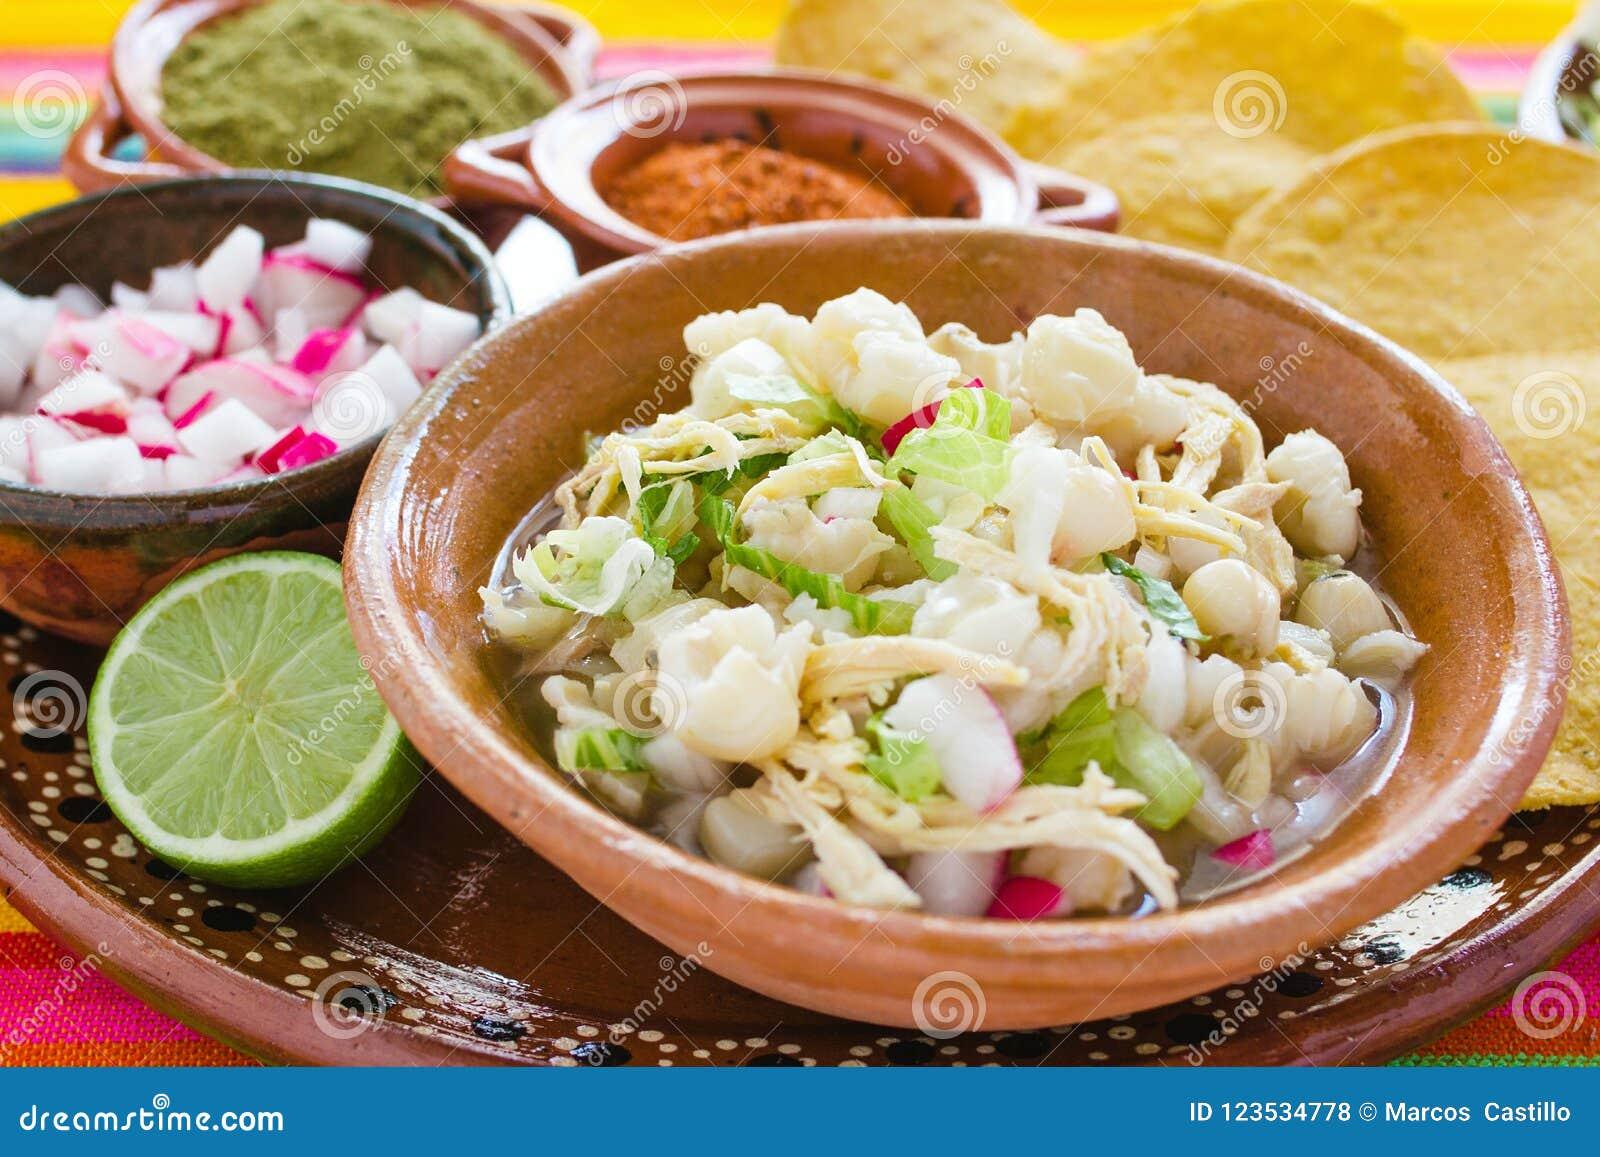 Pozole gjorde mexicansk havresoppa, traditionell mat i Mexico med havrekorn